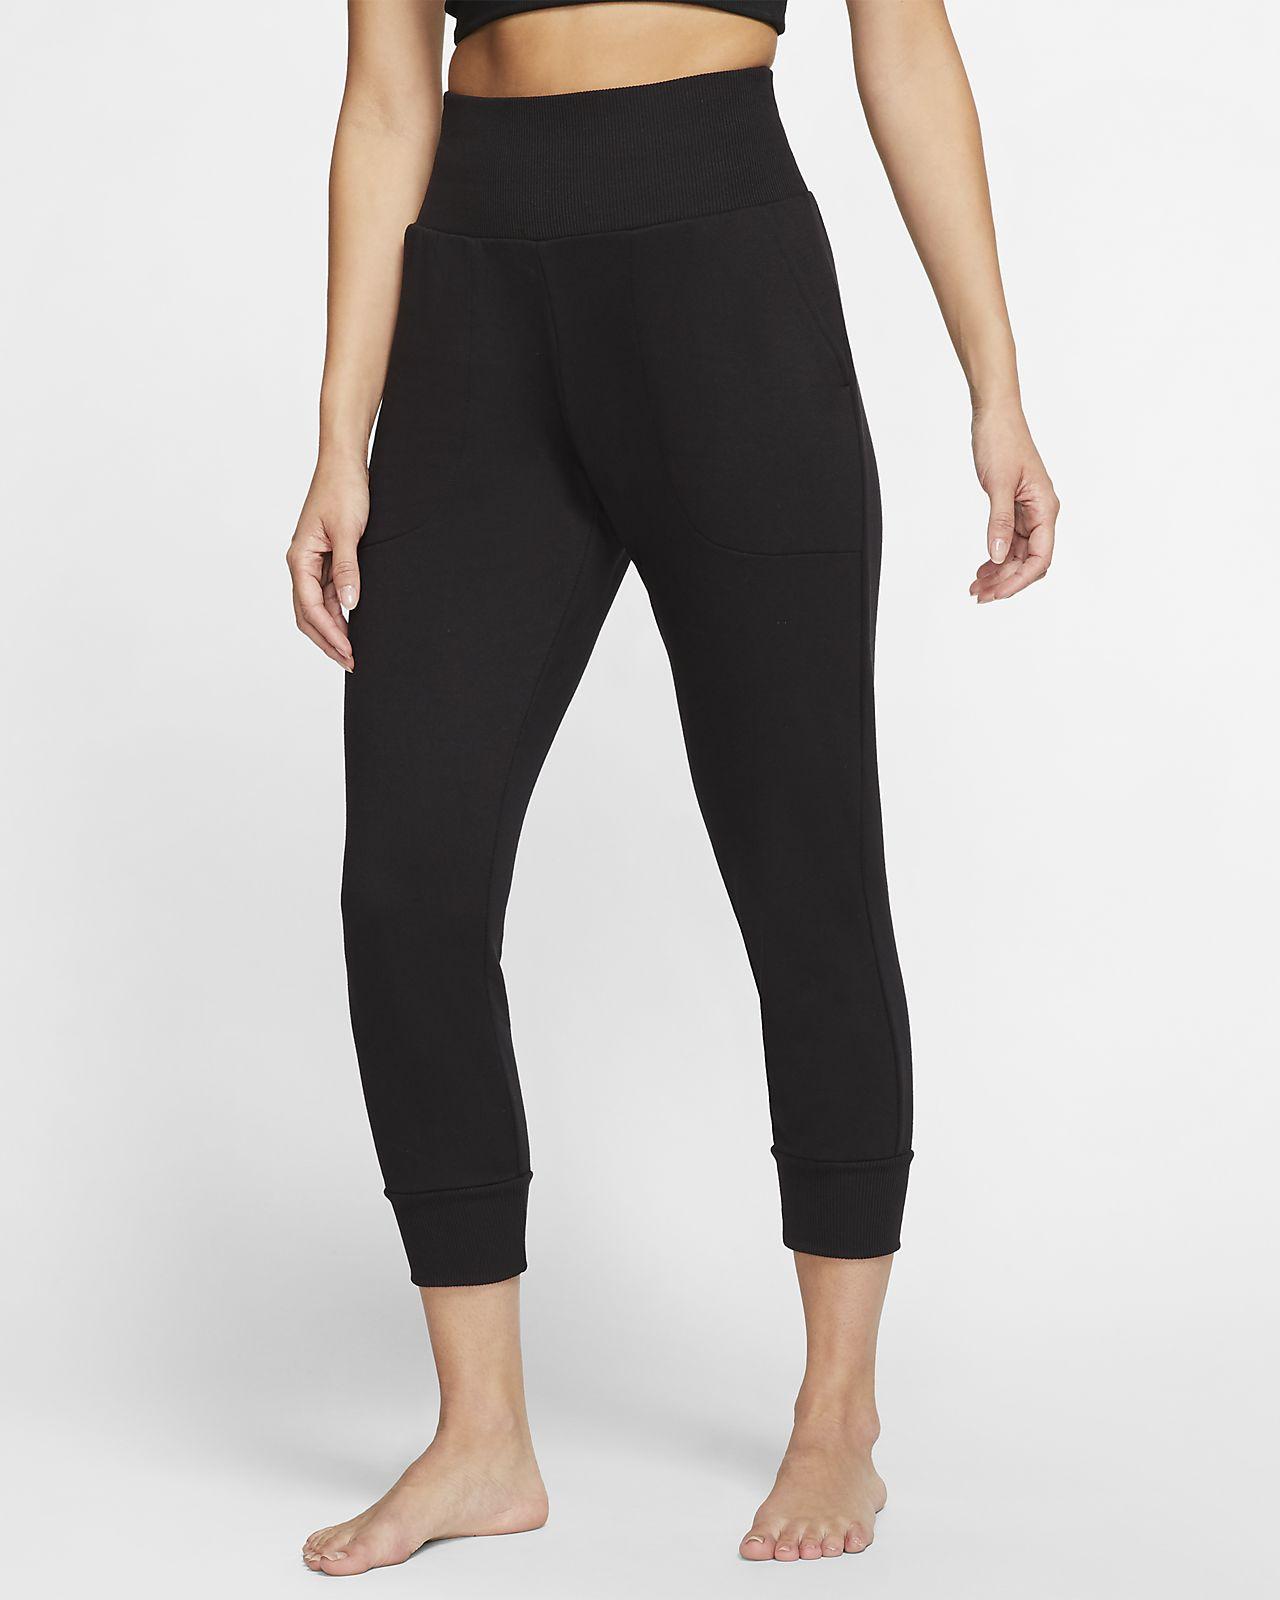 Nike Yoga Women's Trousers